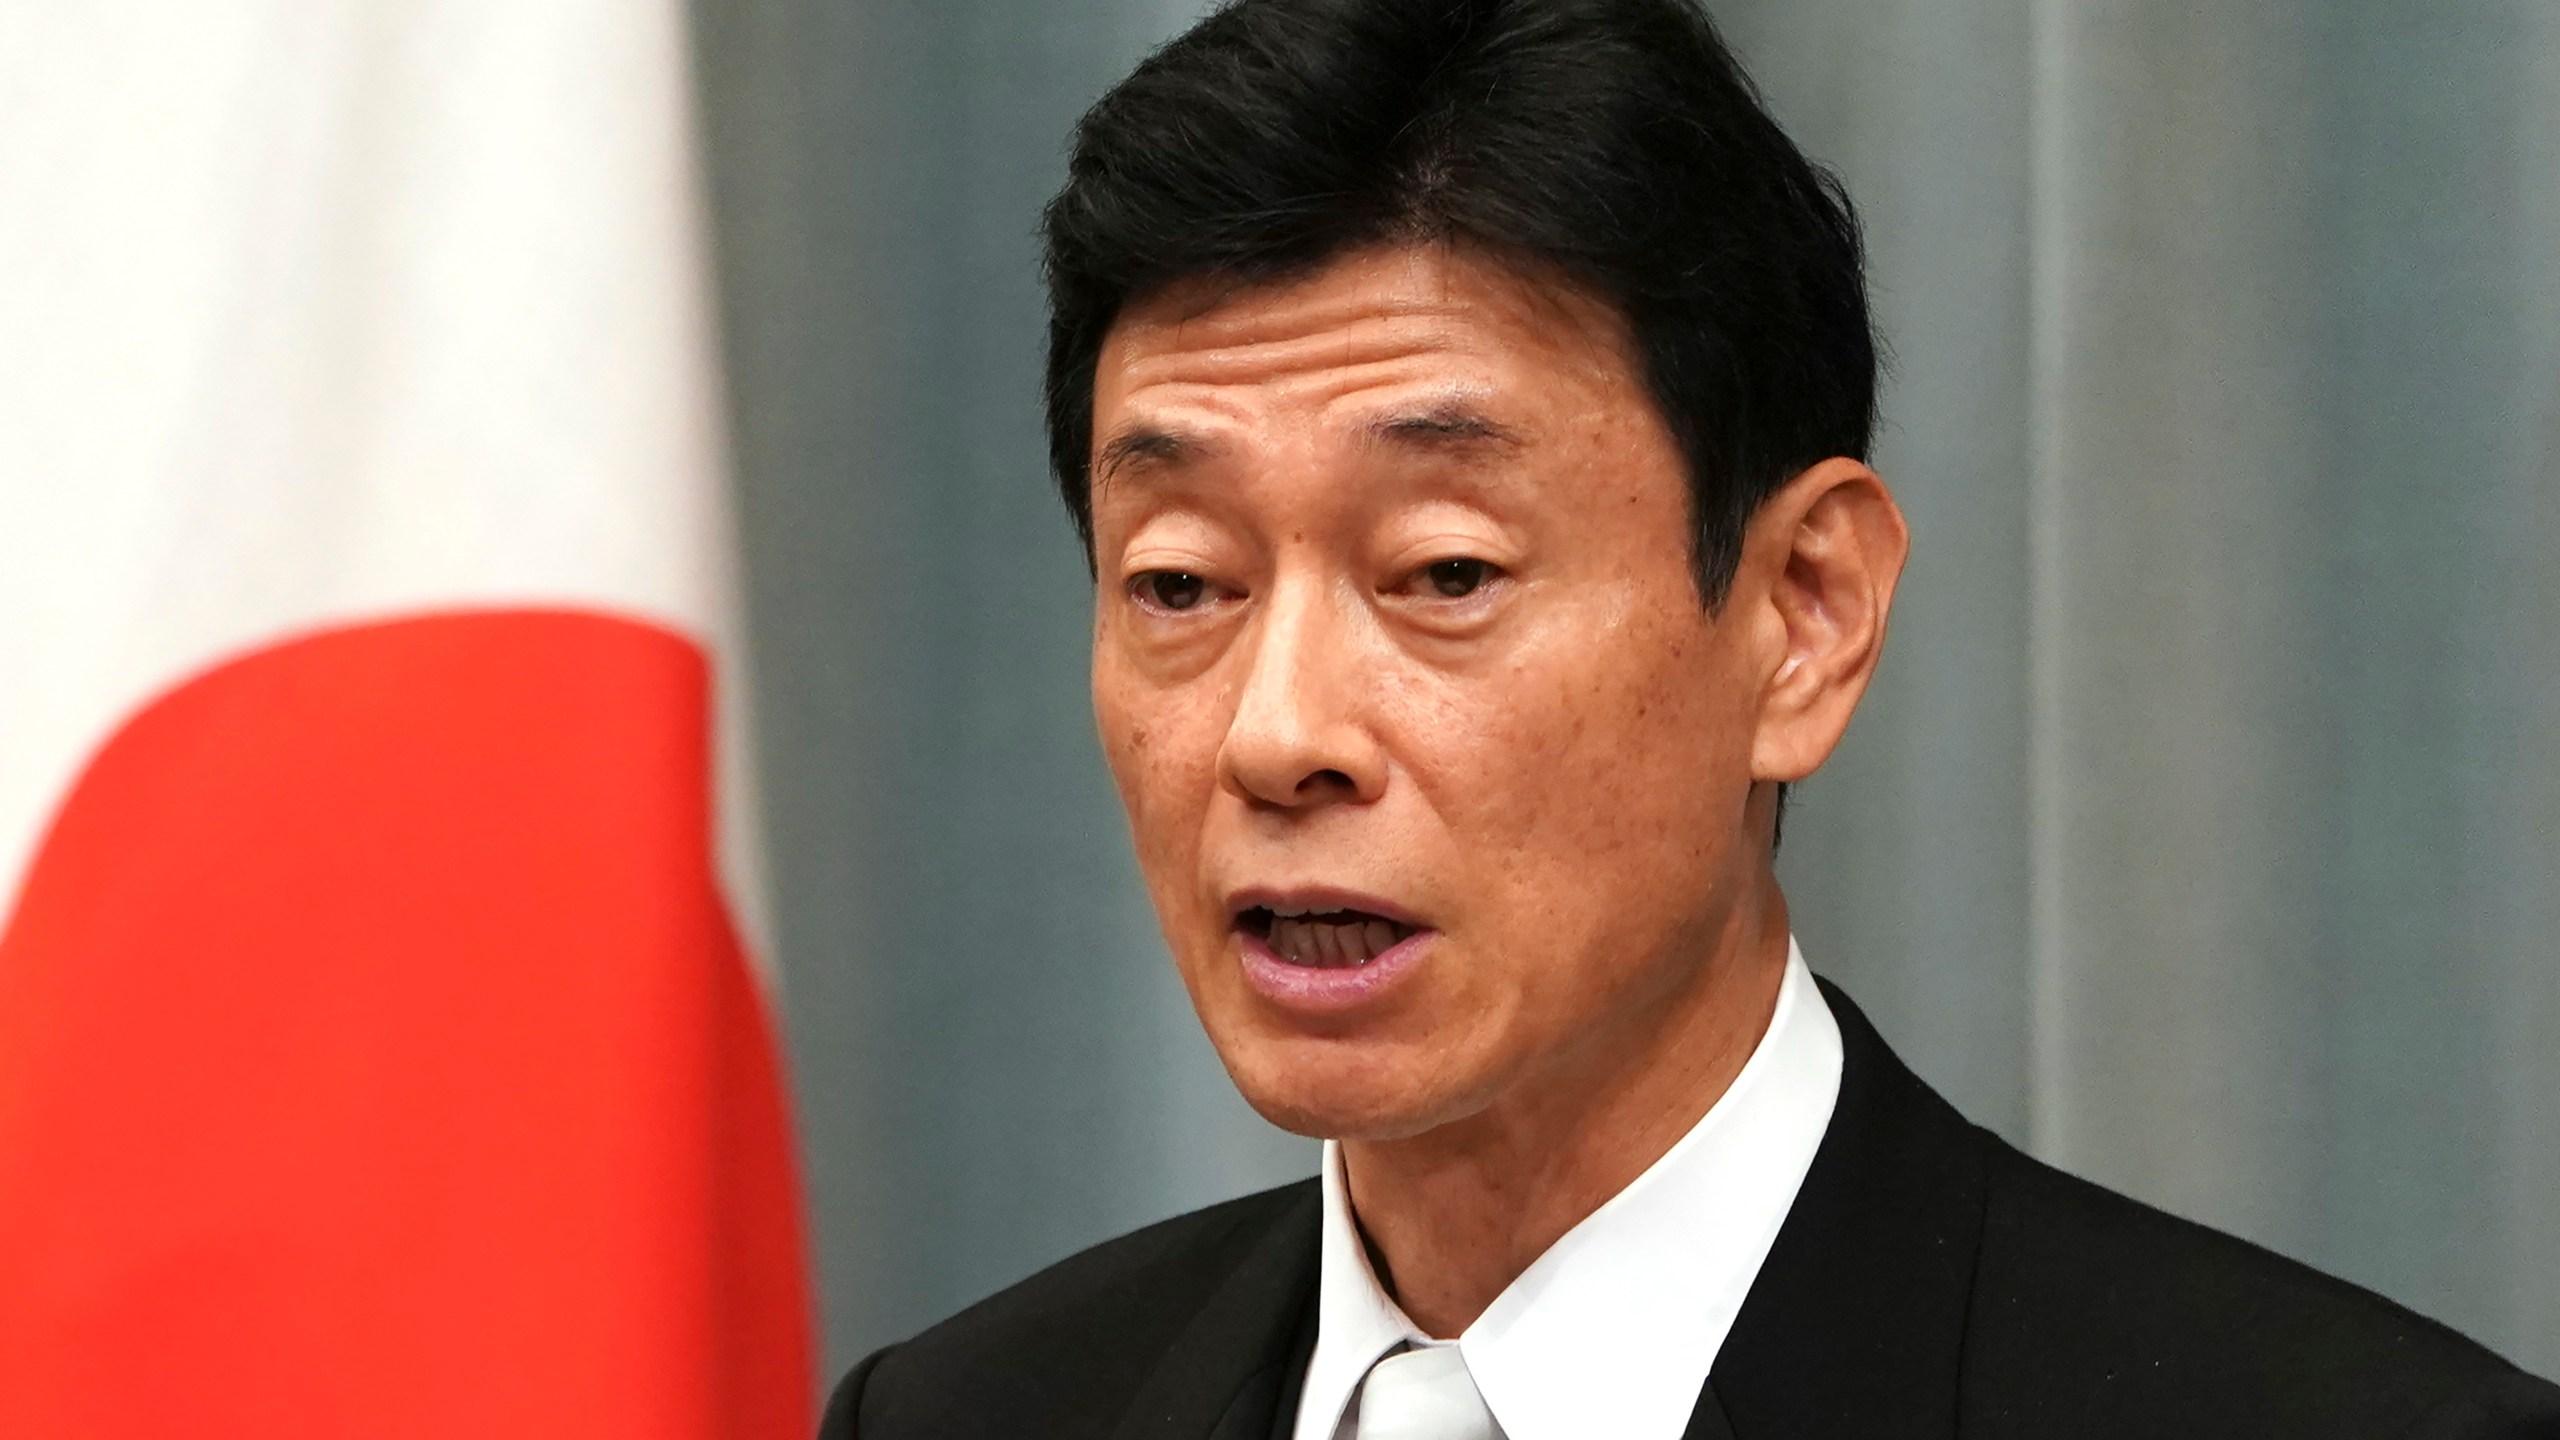 Yasutoshi Nishimura